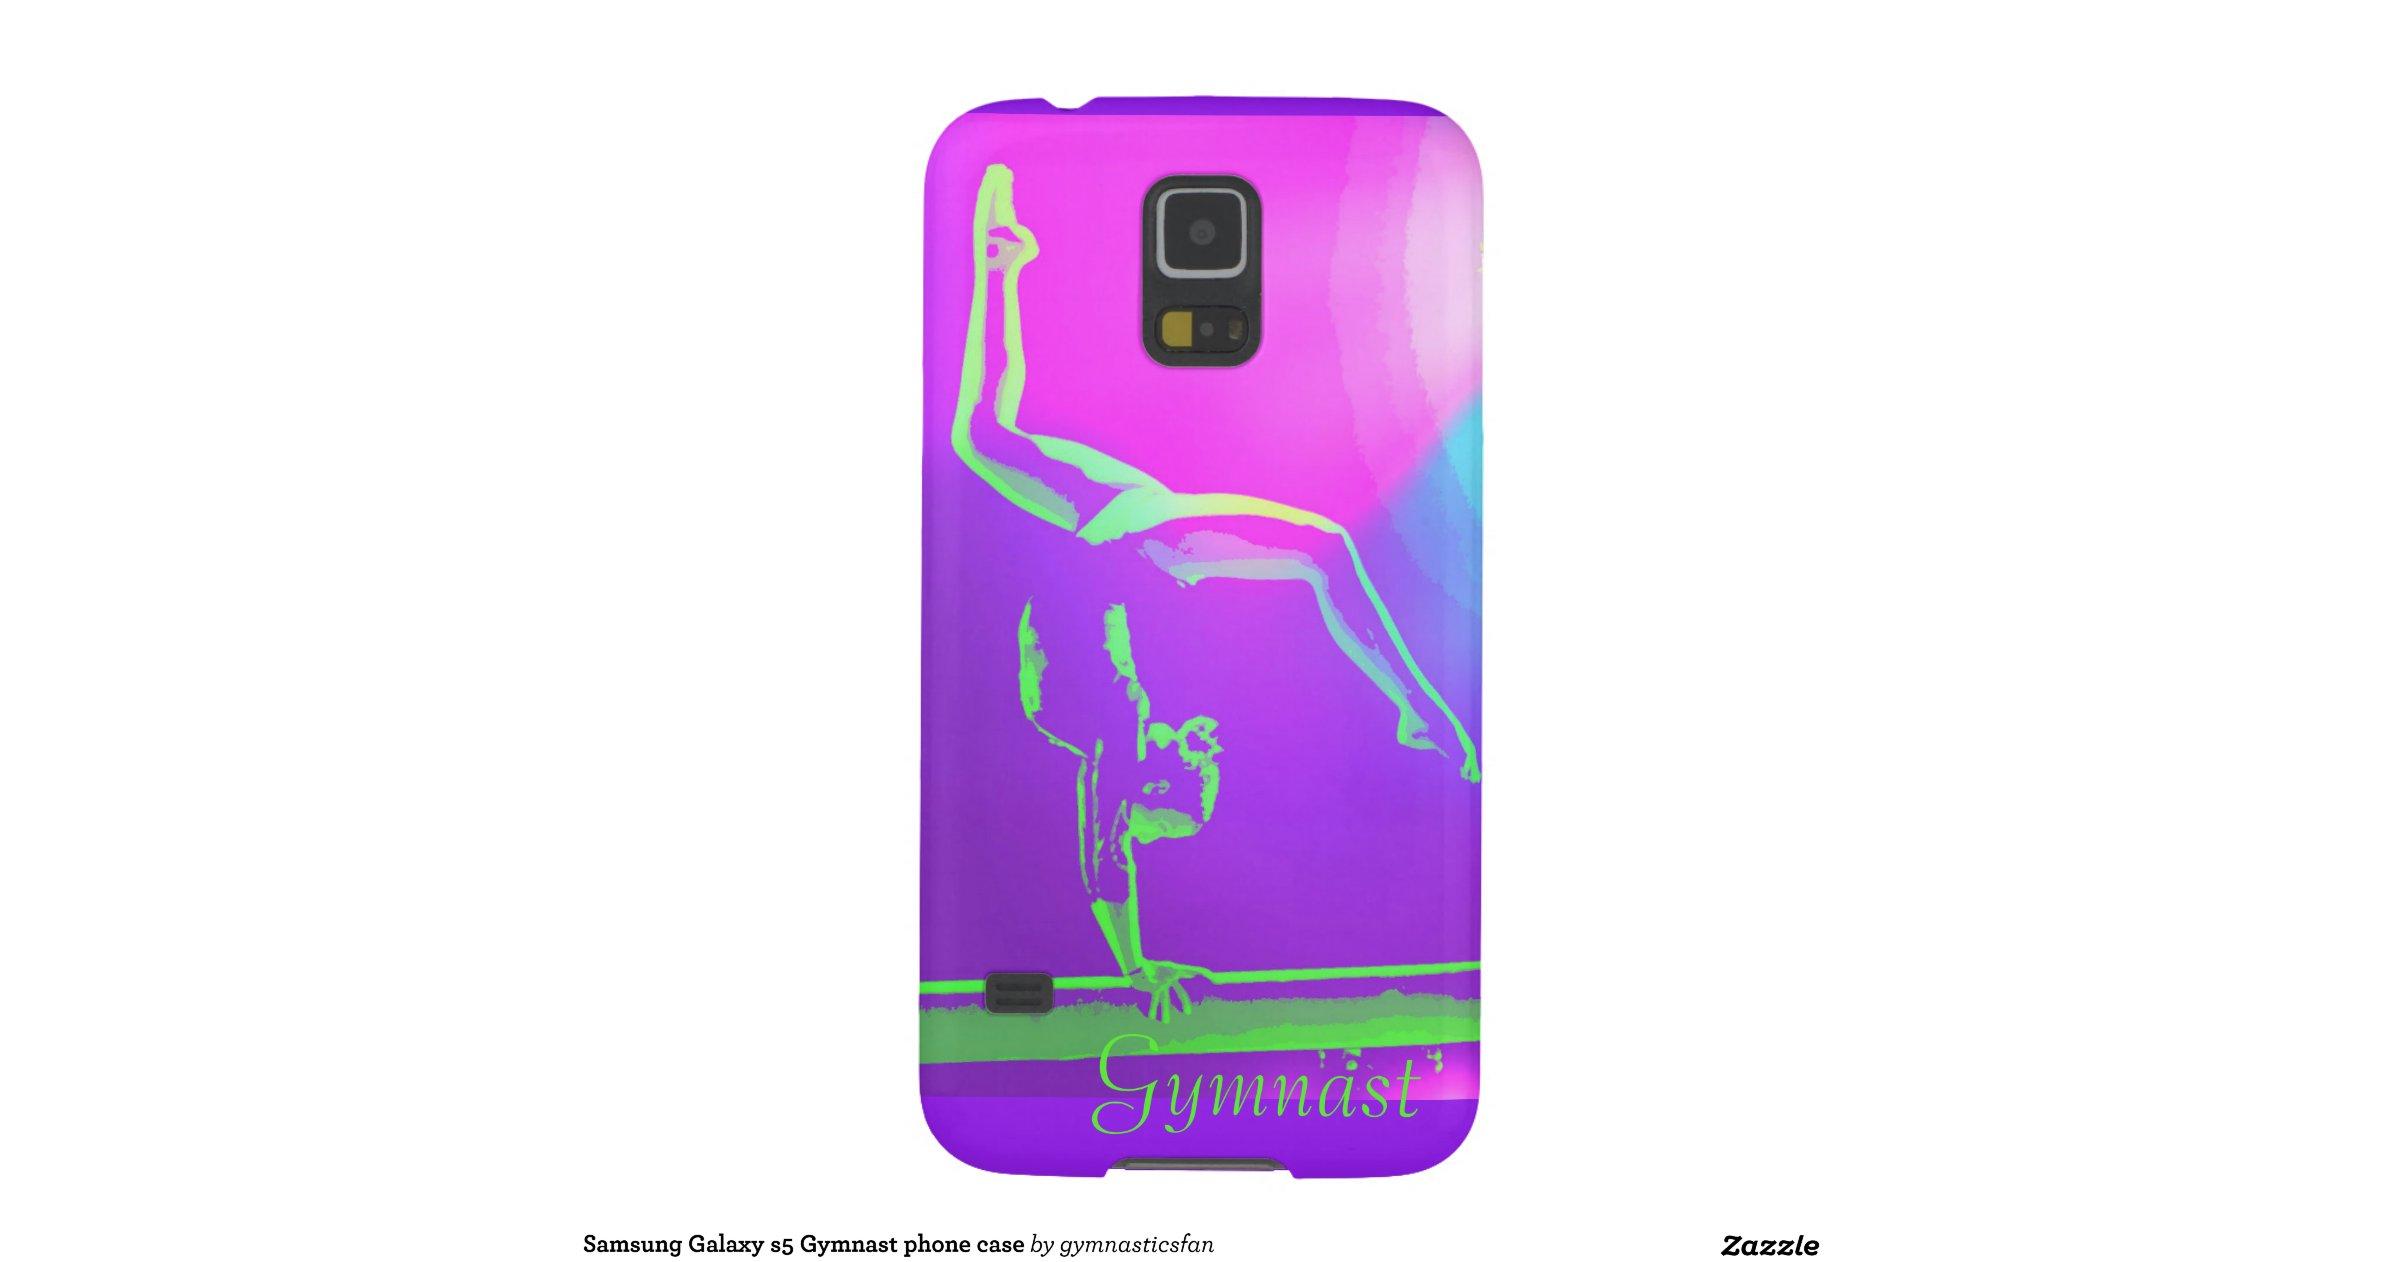 Samsung Galaxy S5 Gymnast Phone Case Cover Zazzle